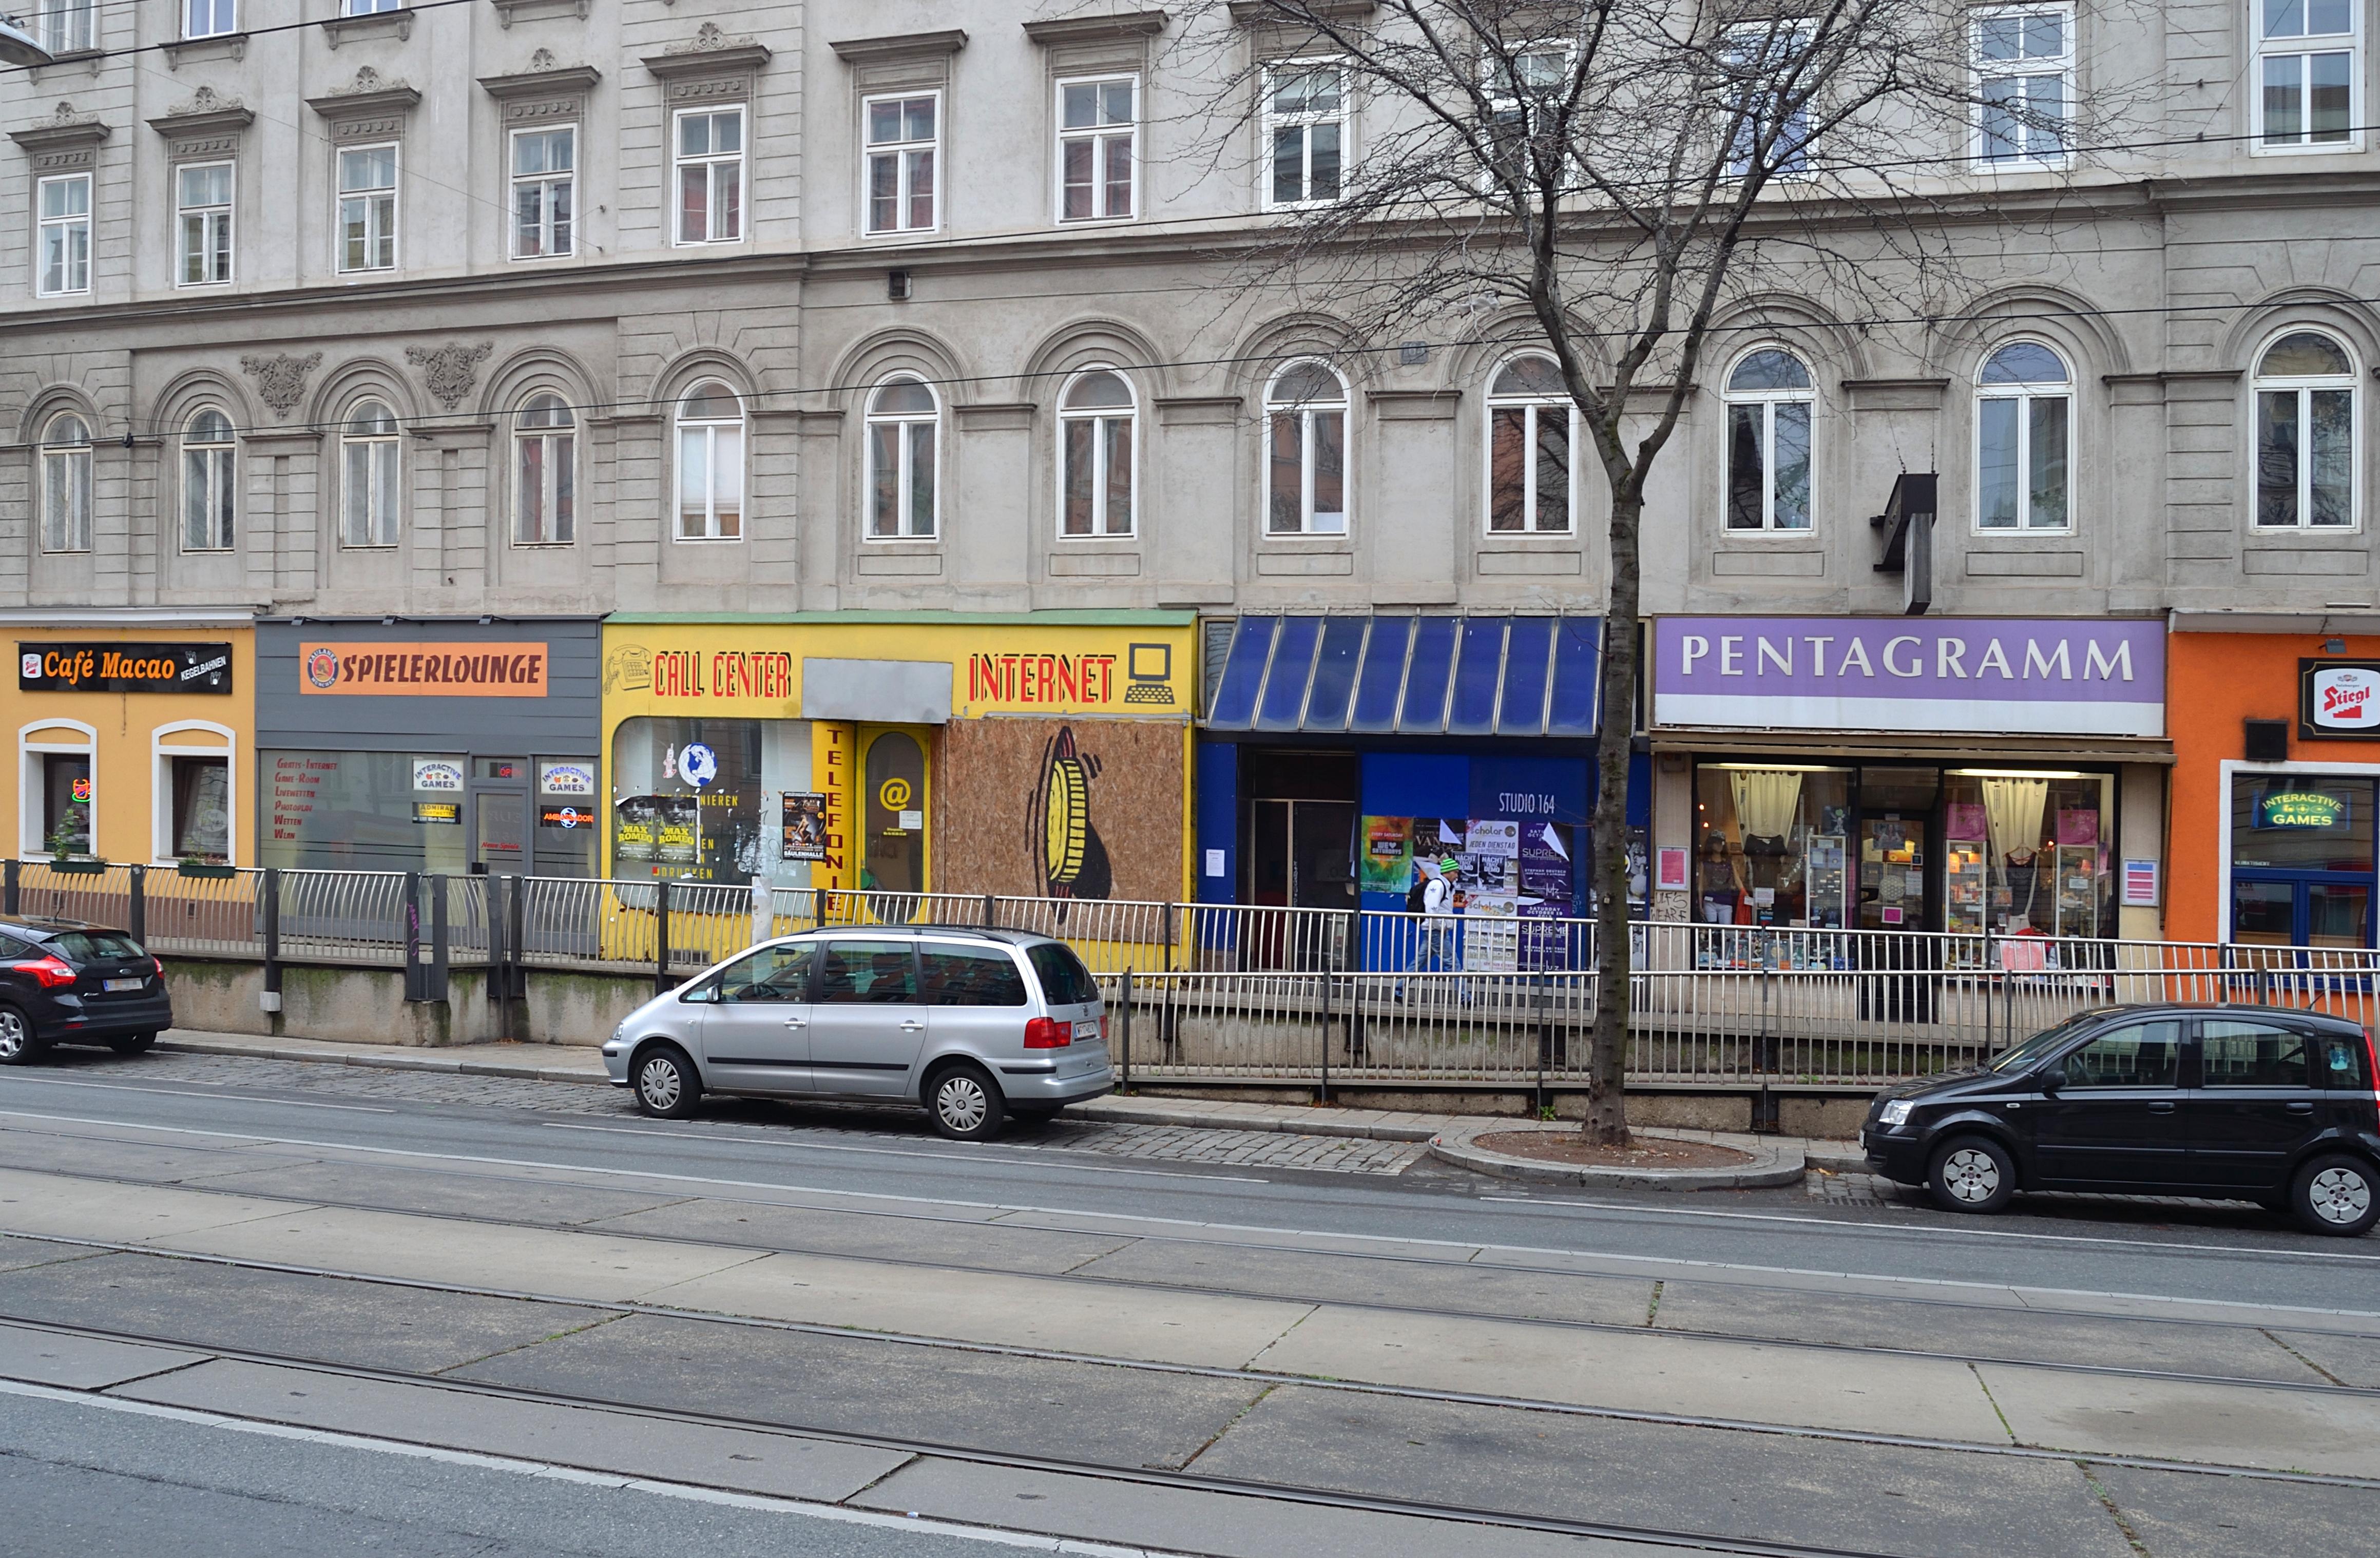 FileÄußere Mariahilferstraße  shopsjpg  Wikimedia Commons -> Vintage Möbel Vienna